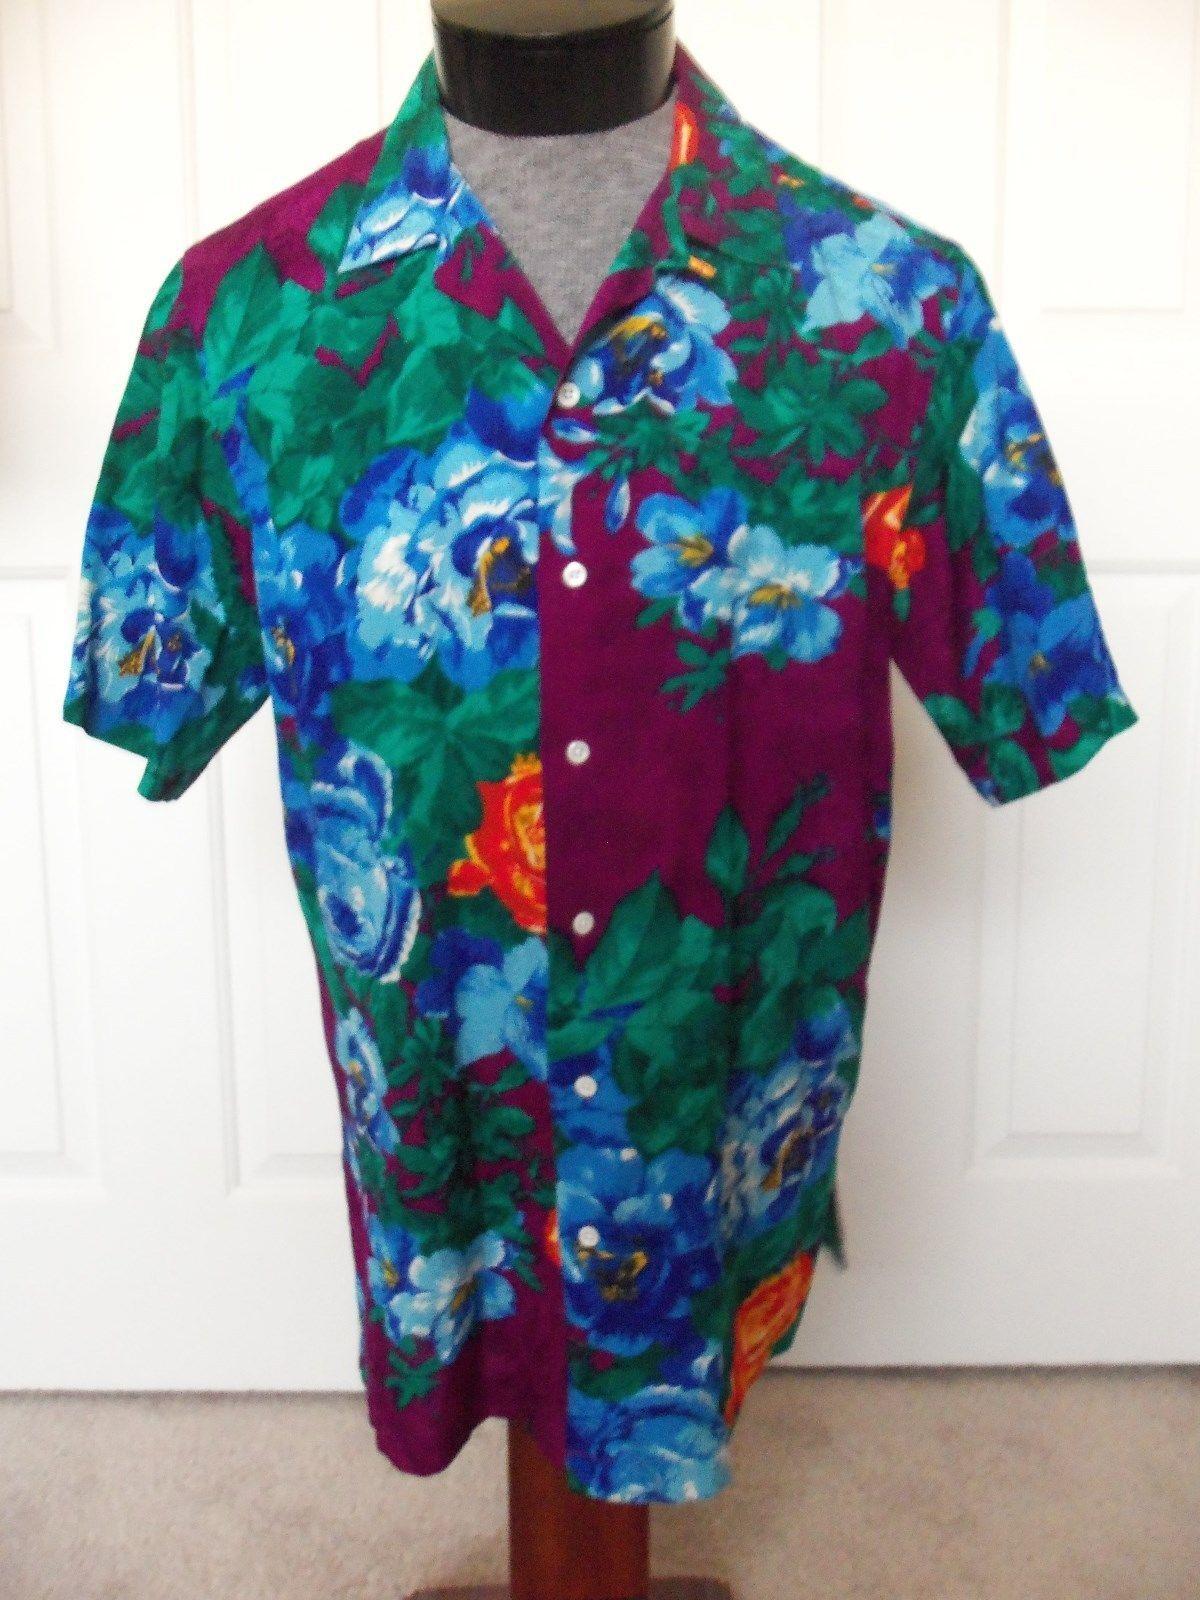 Vintage POLO Ralph Lauren Silk Multi color Floral Short Sleeve Camp Shirt - S